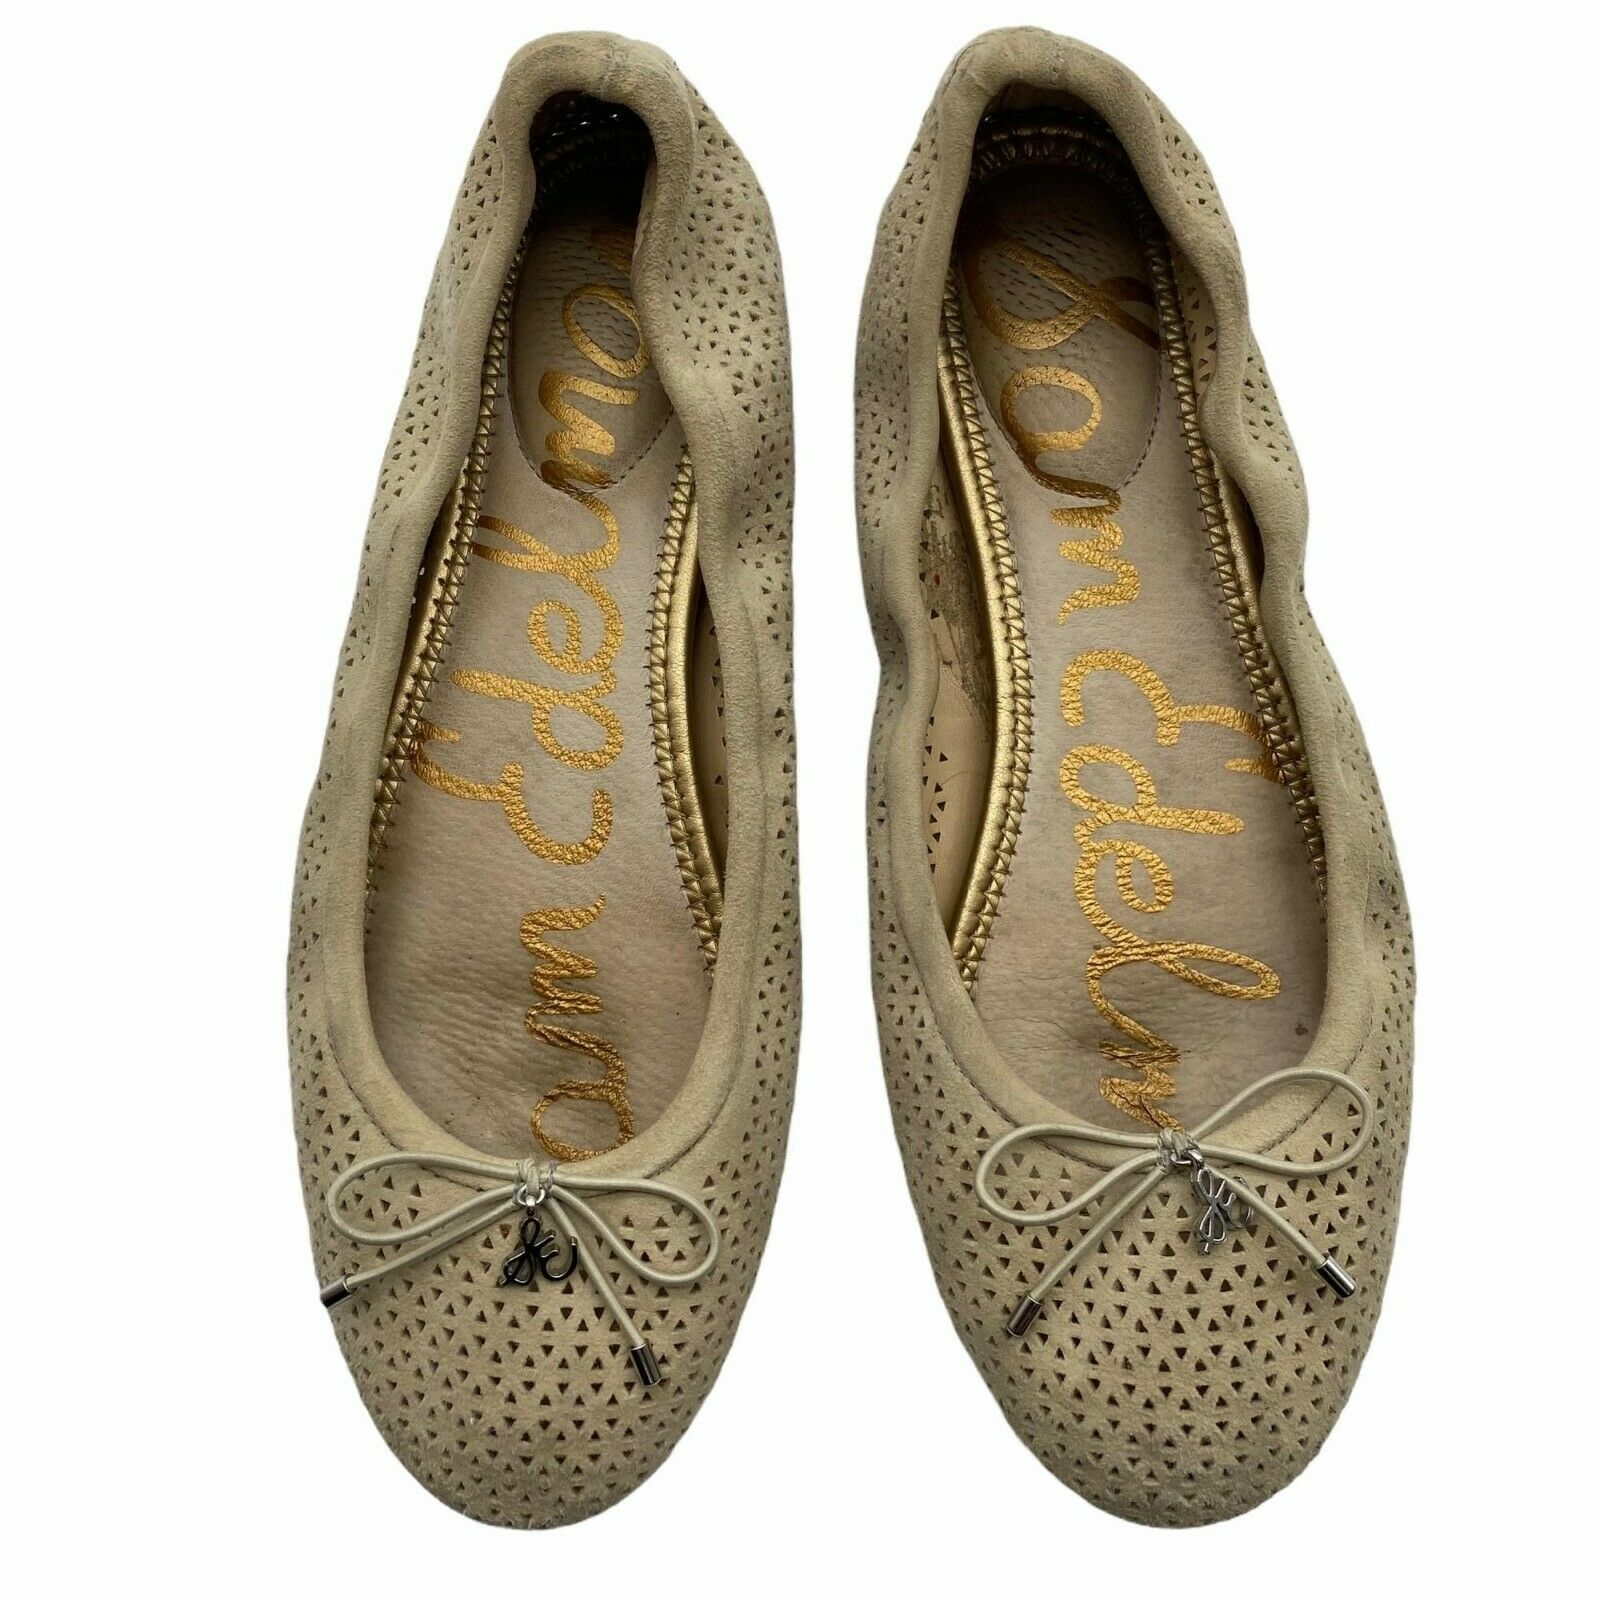 Sam Edelman Felicia 2 Tan Leather cutout detail Ballet Flats Women's 8.5